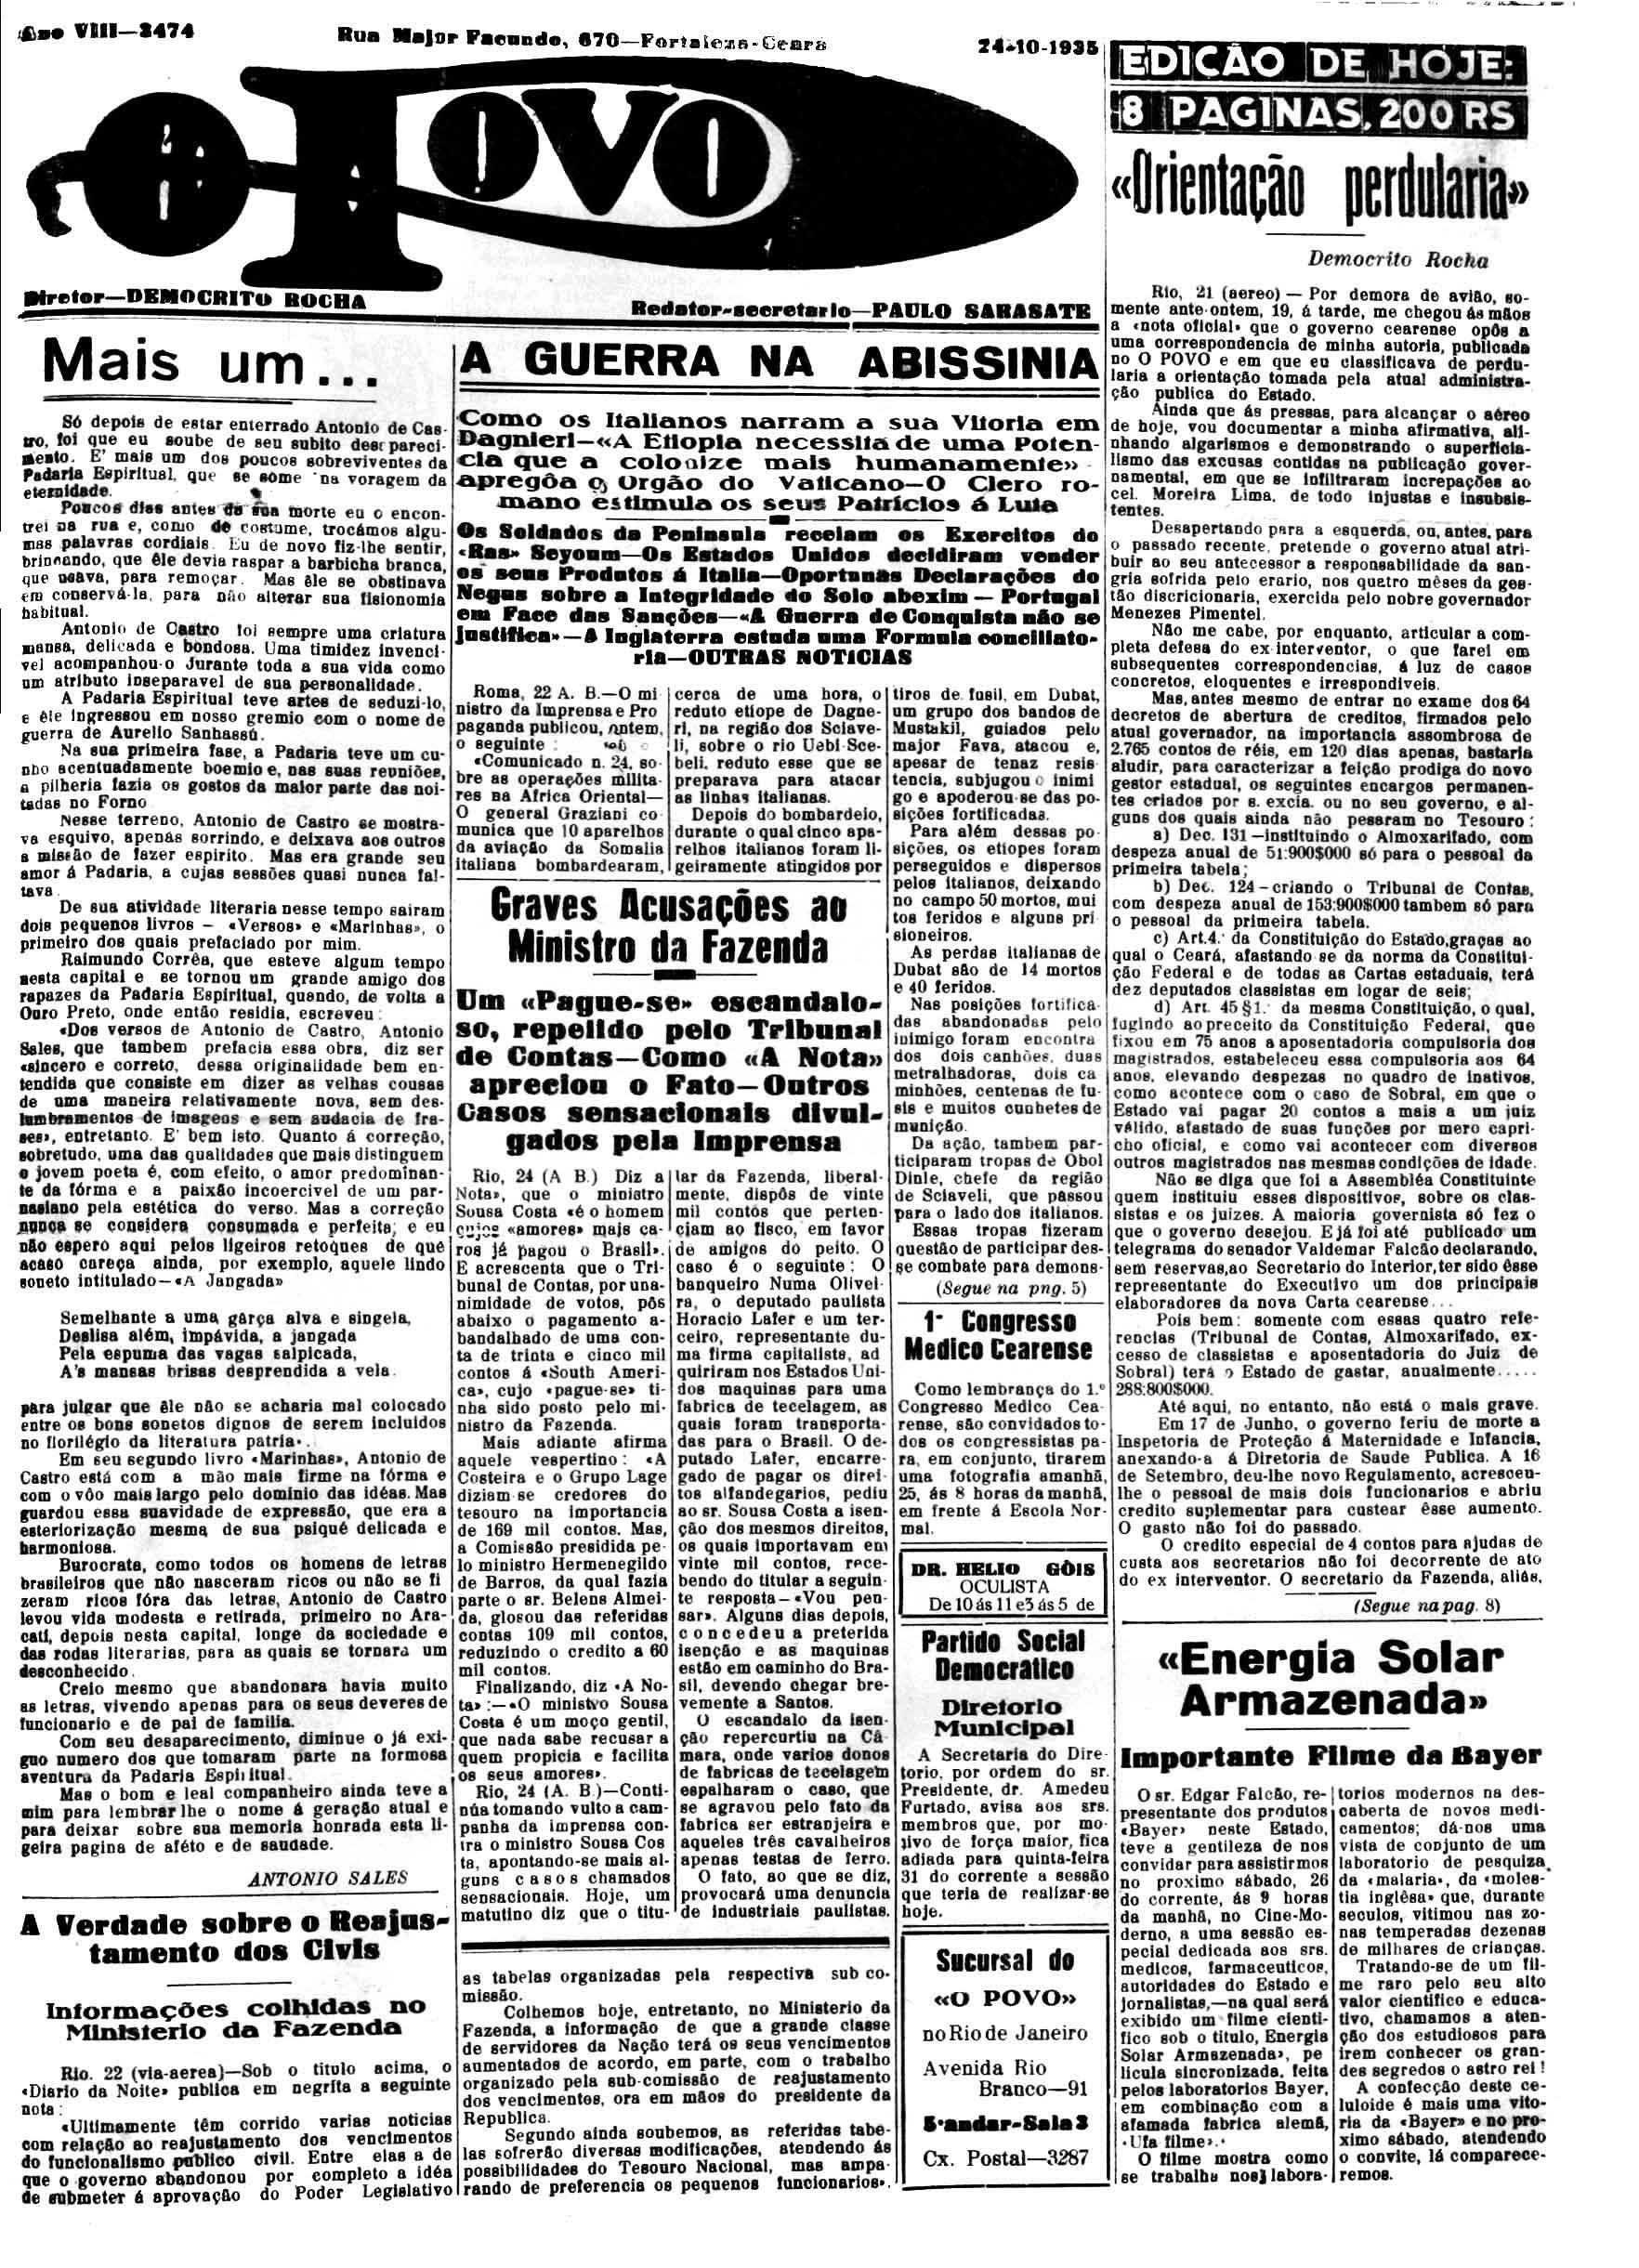 24-10-1935